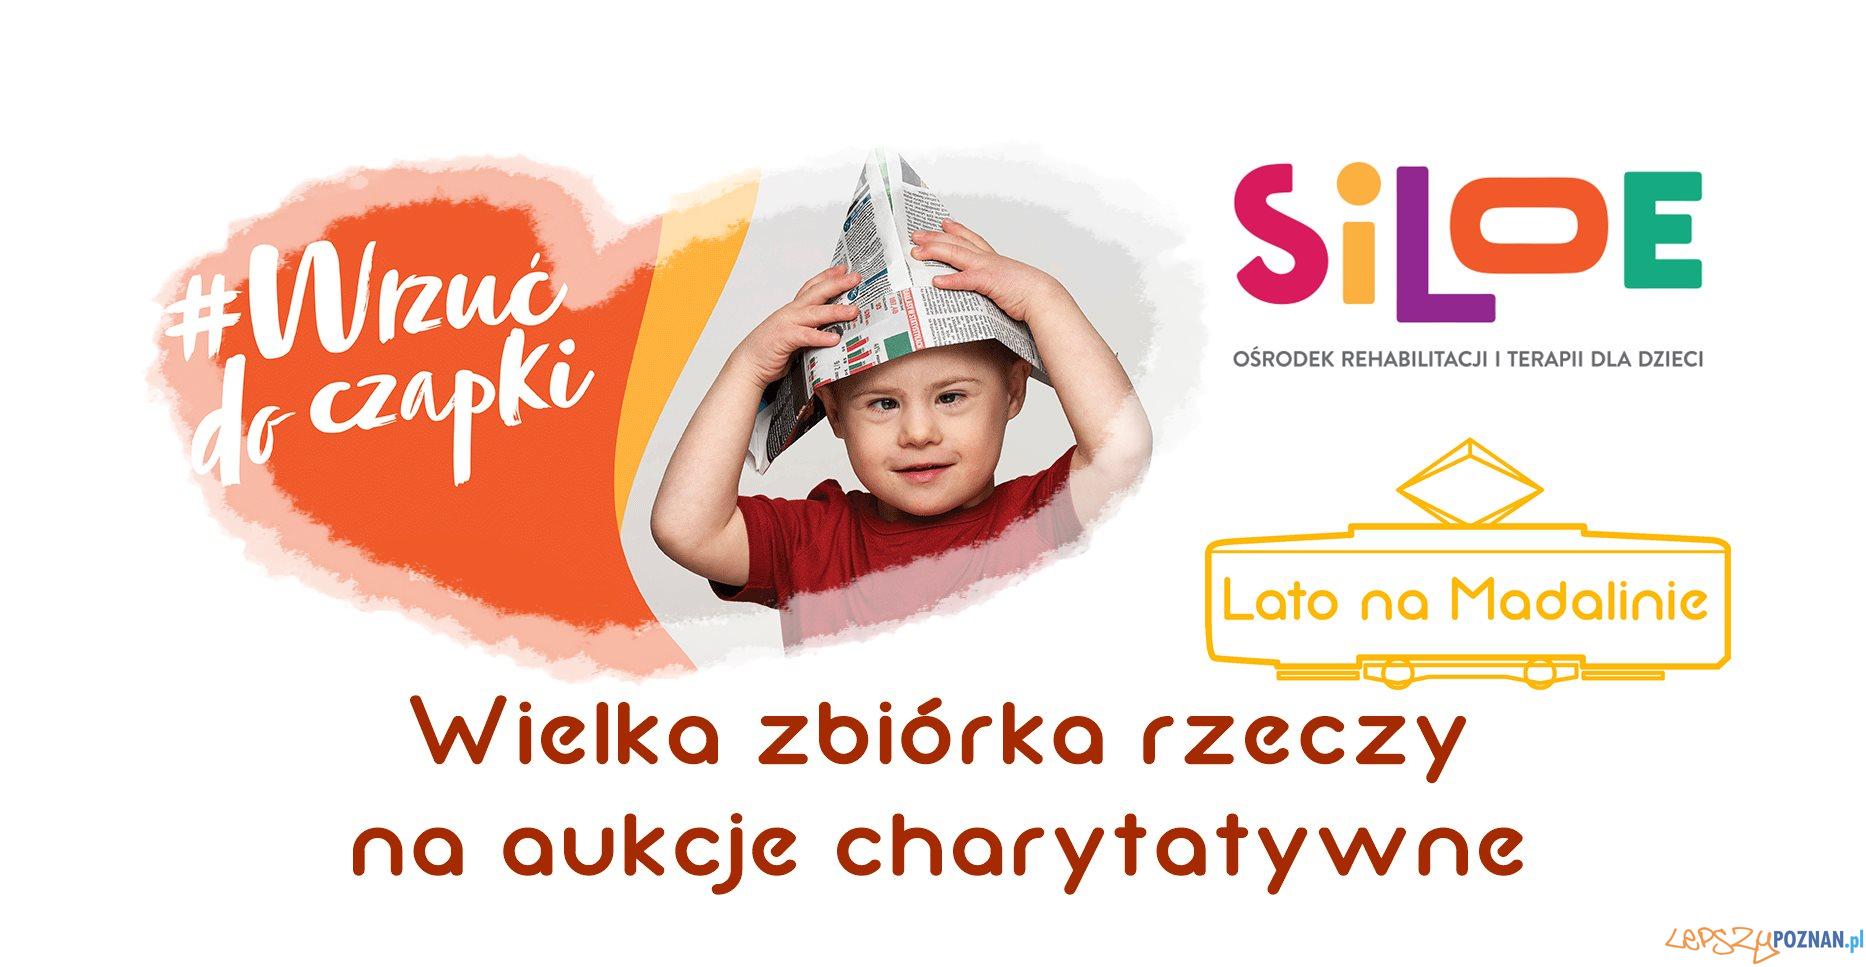 Pomóż Siloe  Foto: materiały prasowe / SILOE